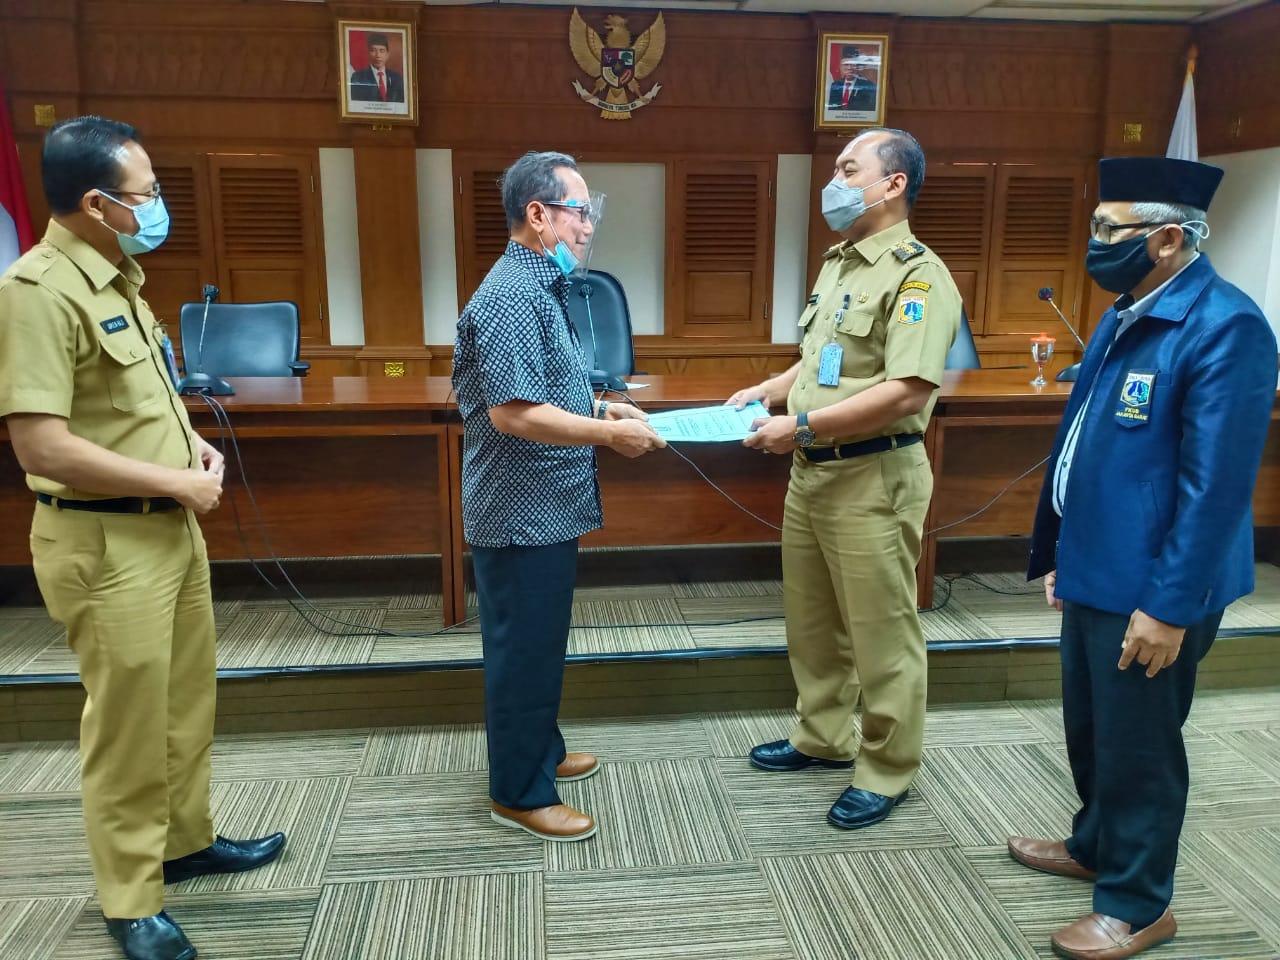 Walikota Uus Kuswanto Didampingi Ketua FKUB Serahkan Surat Rekomendasi Pembangunan Masjid Attabayun